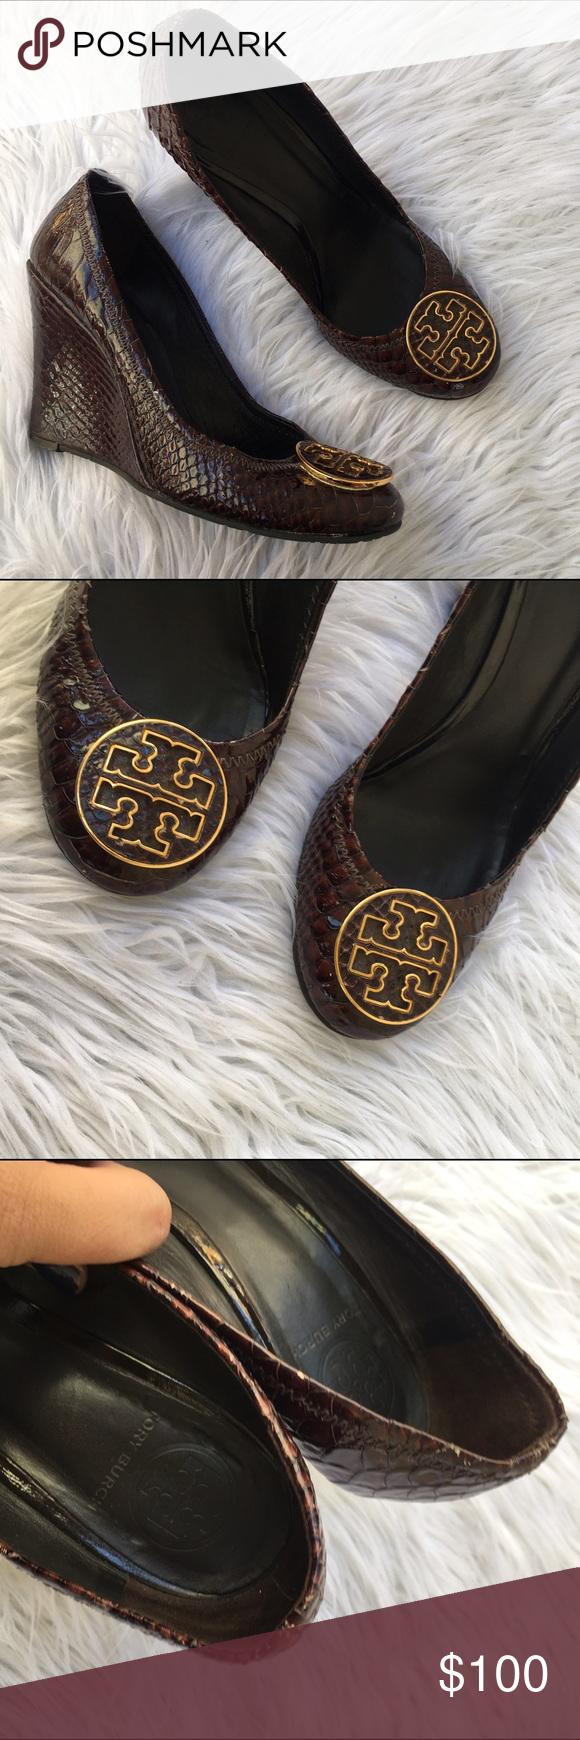 Tory burch reva wedge sz 8.5 shoes heels snakeskin